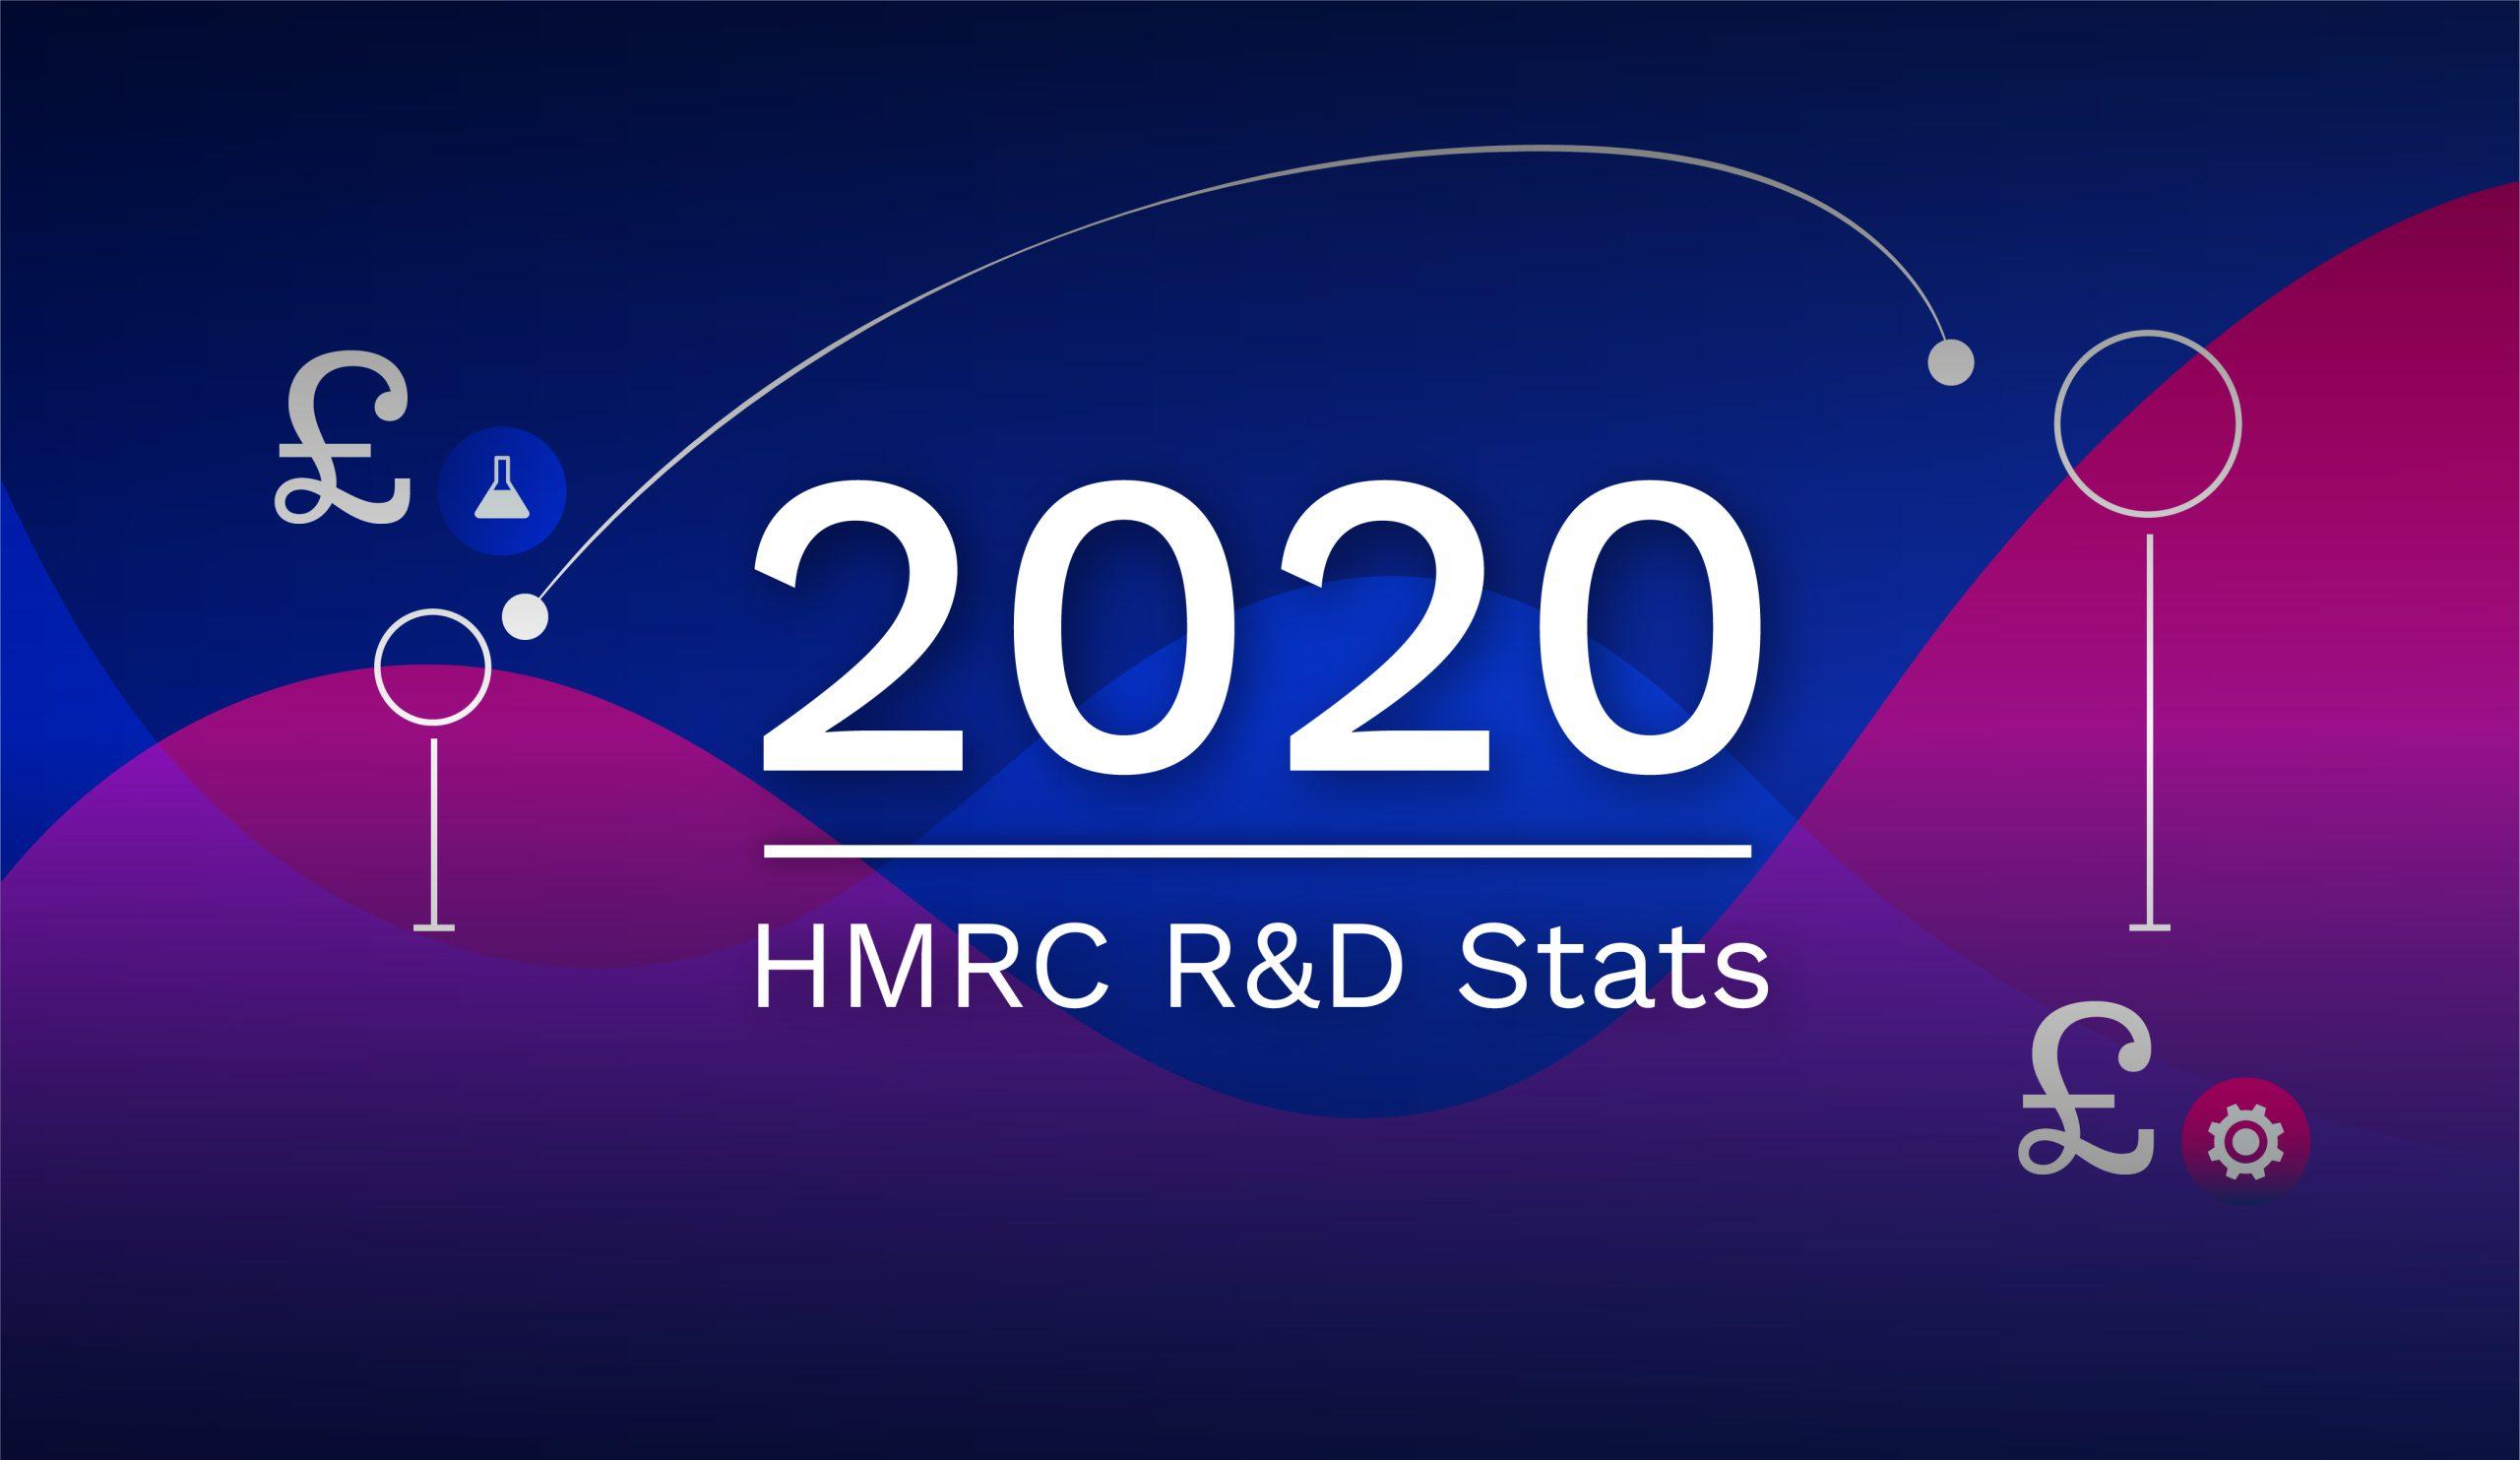 Illustration of Research and Development Tax Credit Statistics 2020